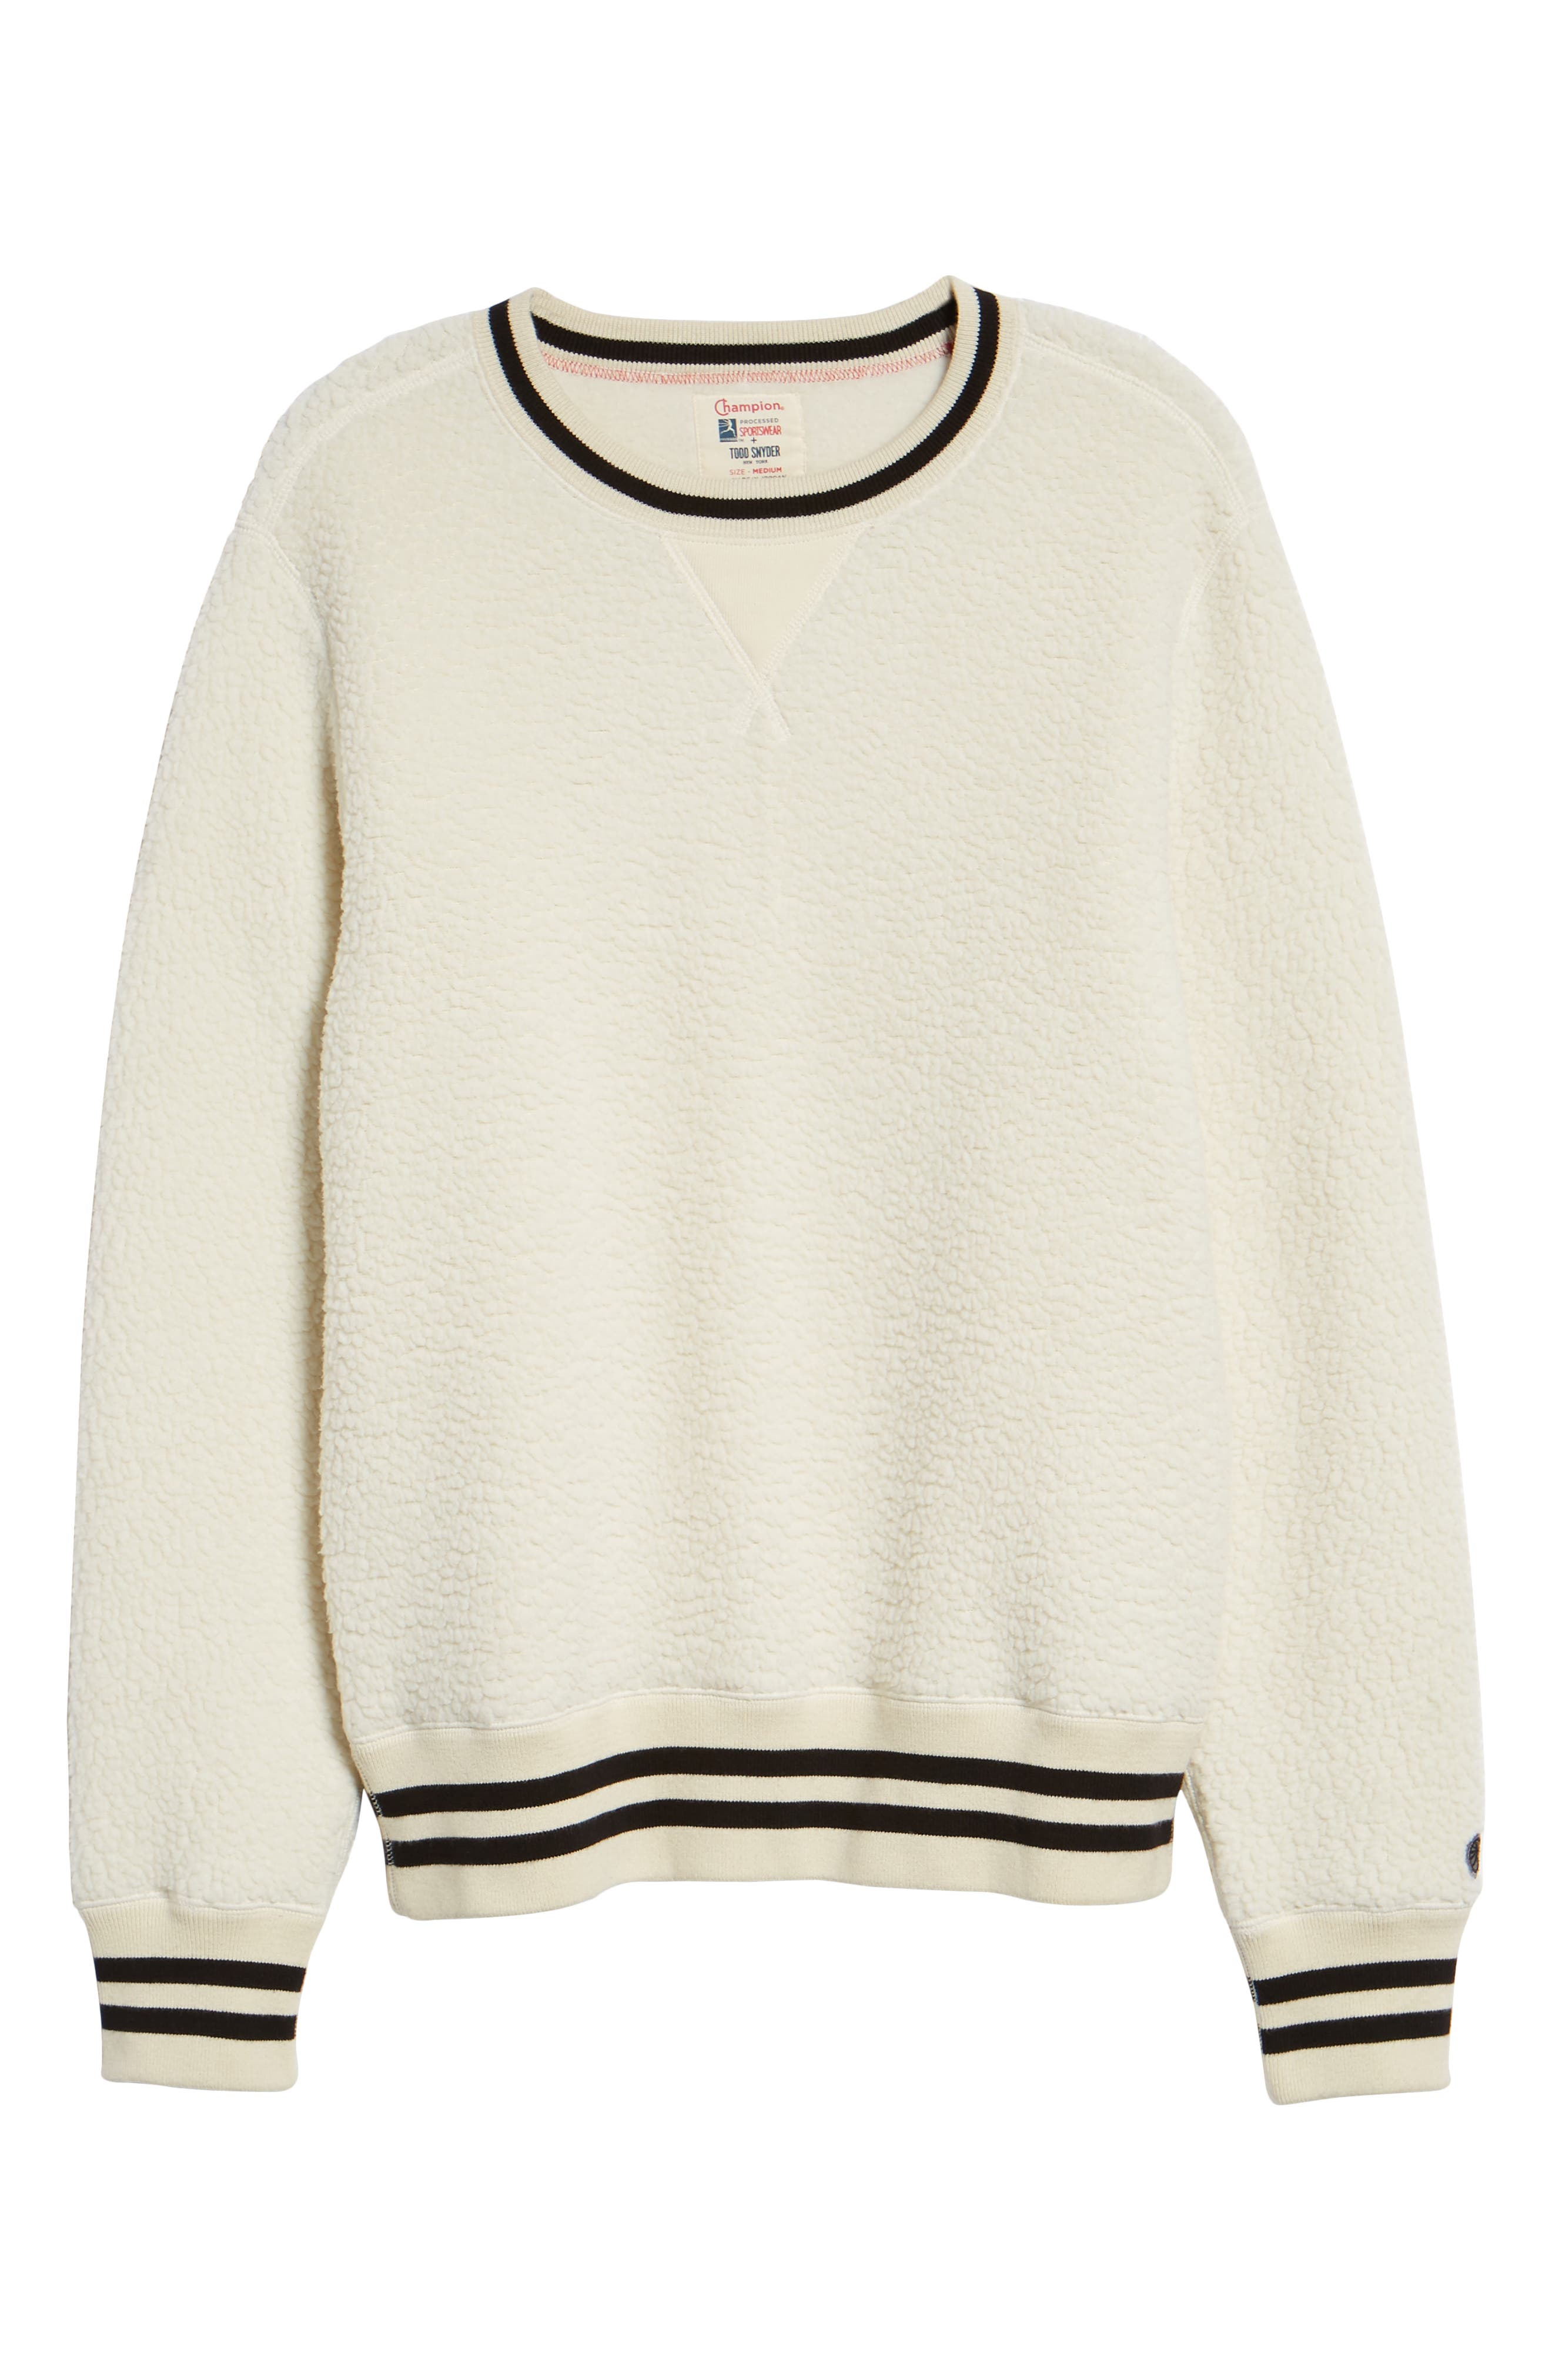 + Champion Fleece Crewneck Sweatshirt,                             Alternate thumbnail 6, color,                             900